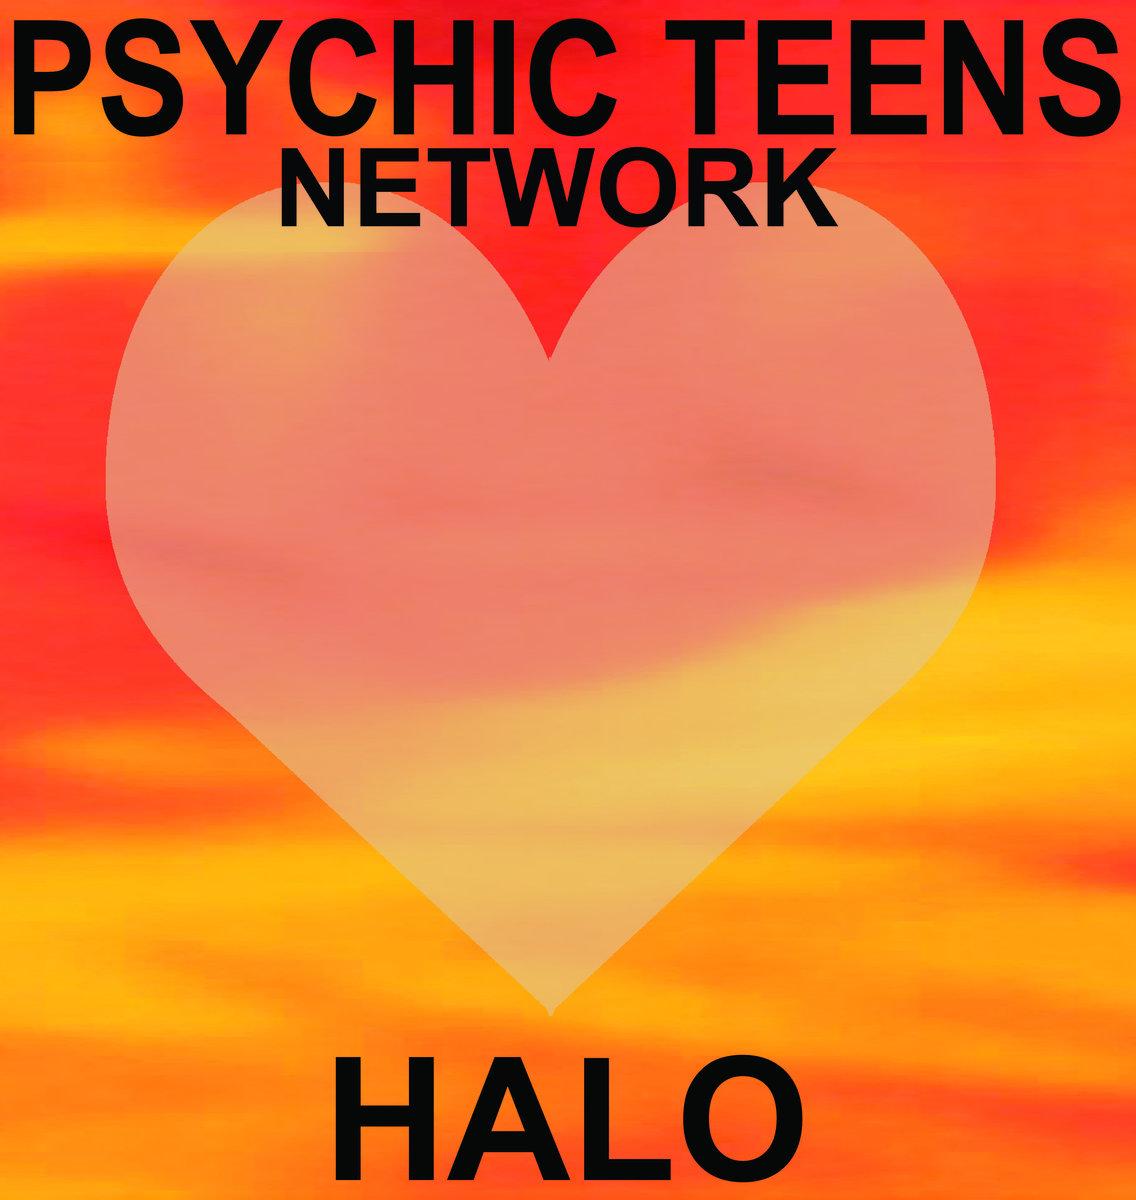 Psychic Teens • Halo